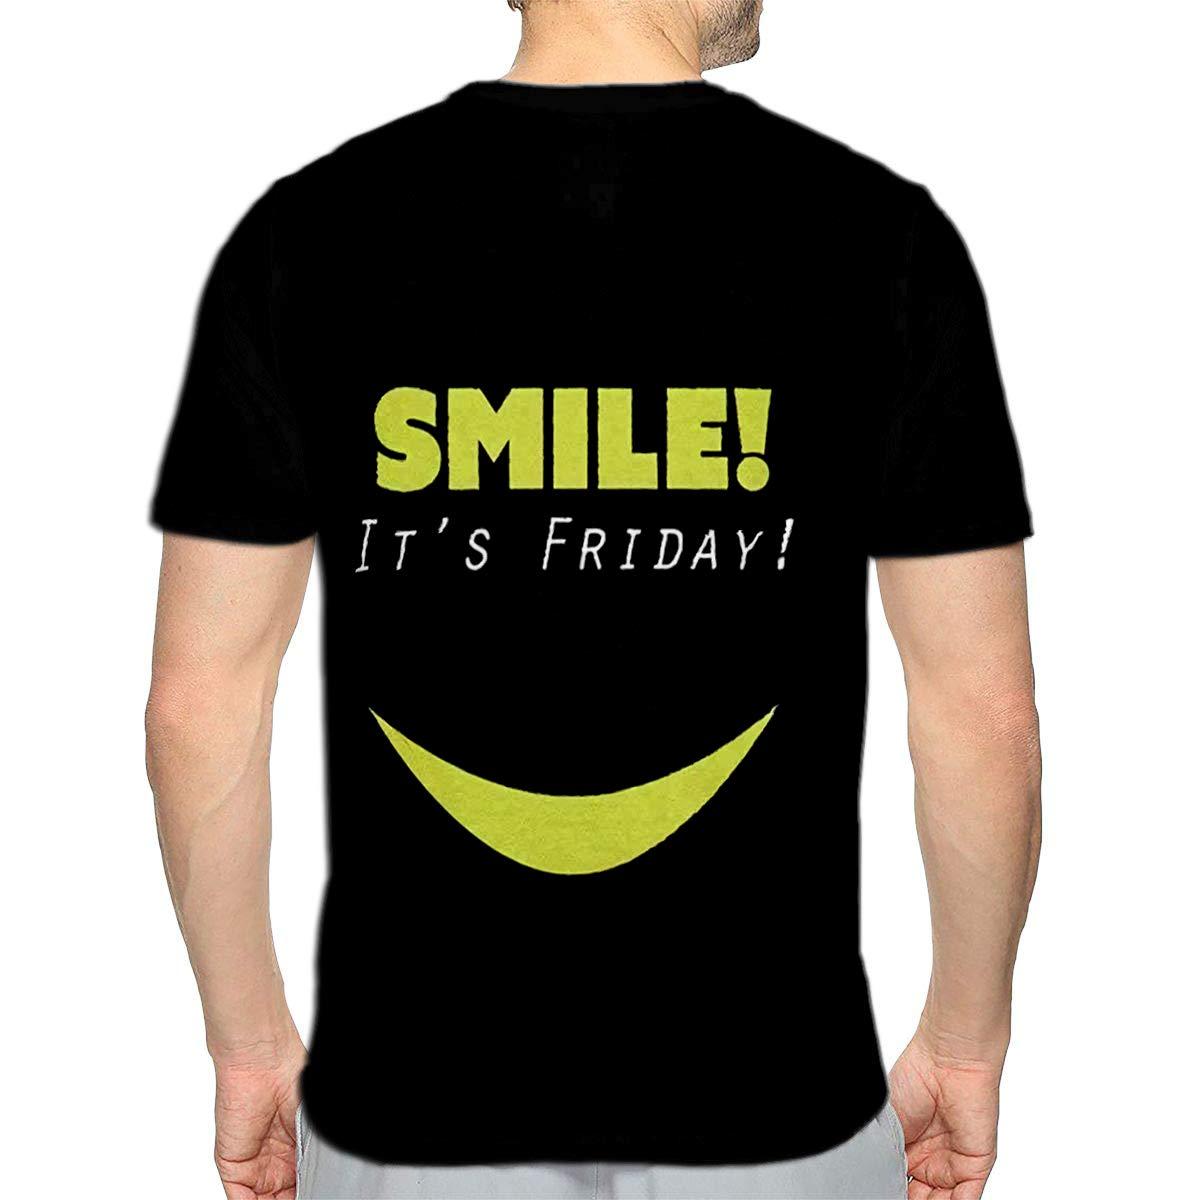 3D Printed T-Shirts Polka Dot Geometric Dots Circles and Buttons Short Sleeve to